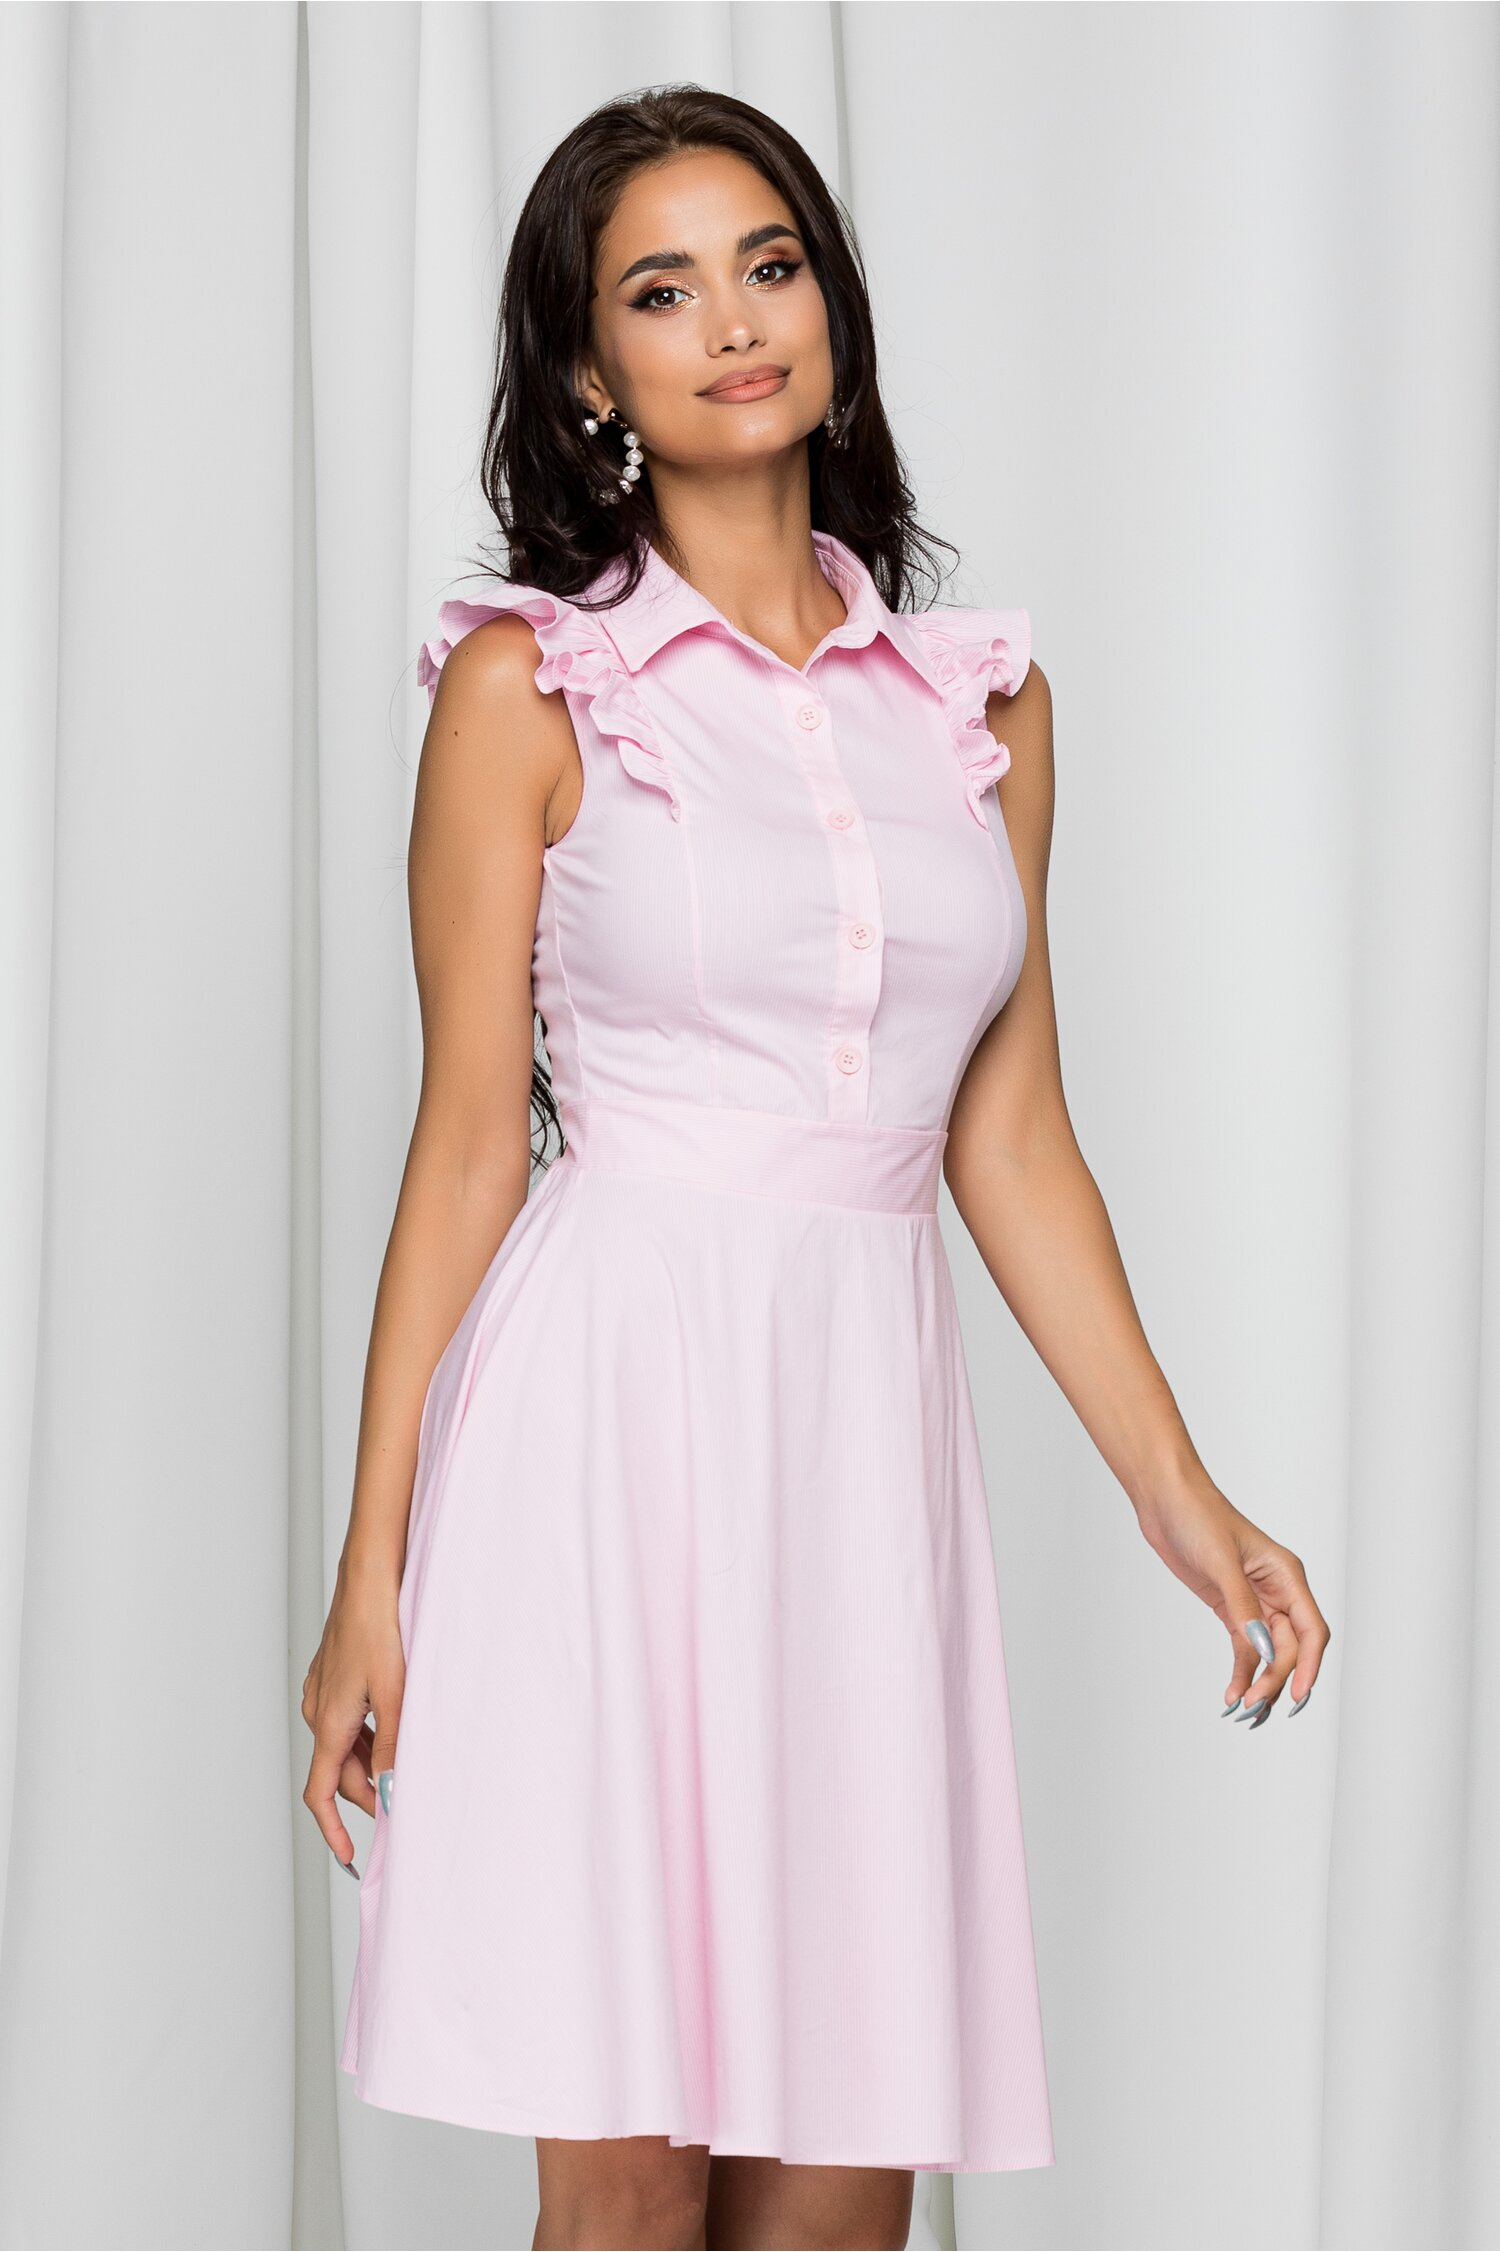 Rochie Klara roz cu dungi albe si volanase la umeri